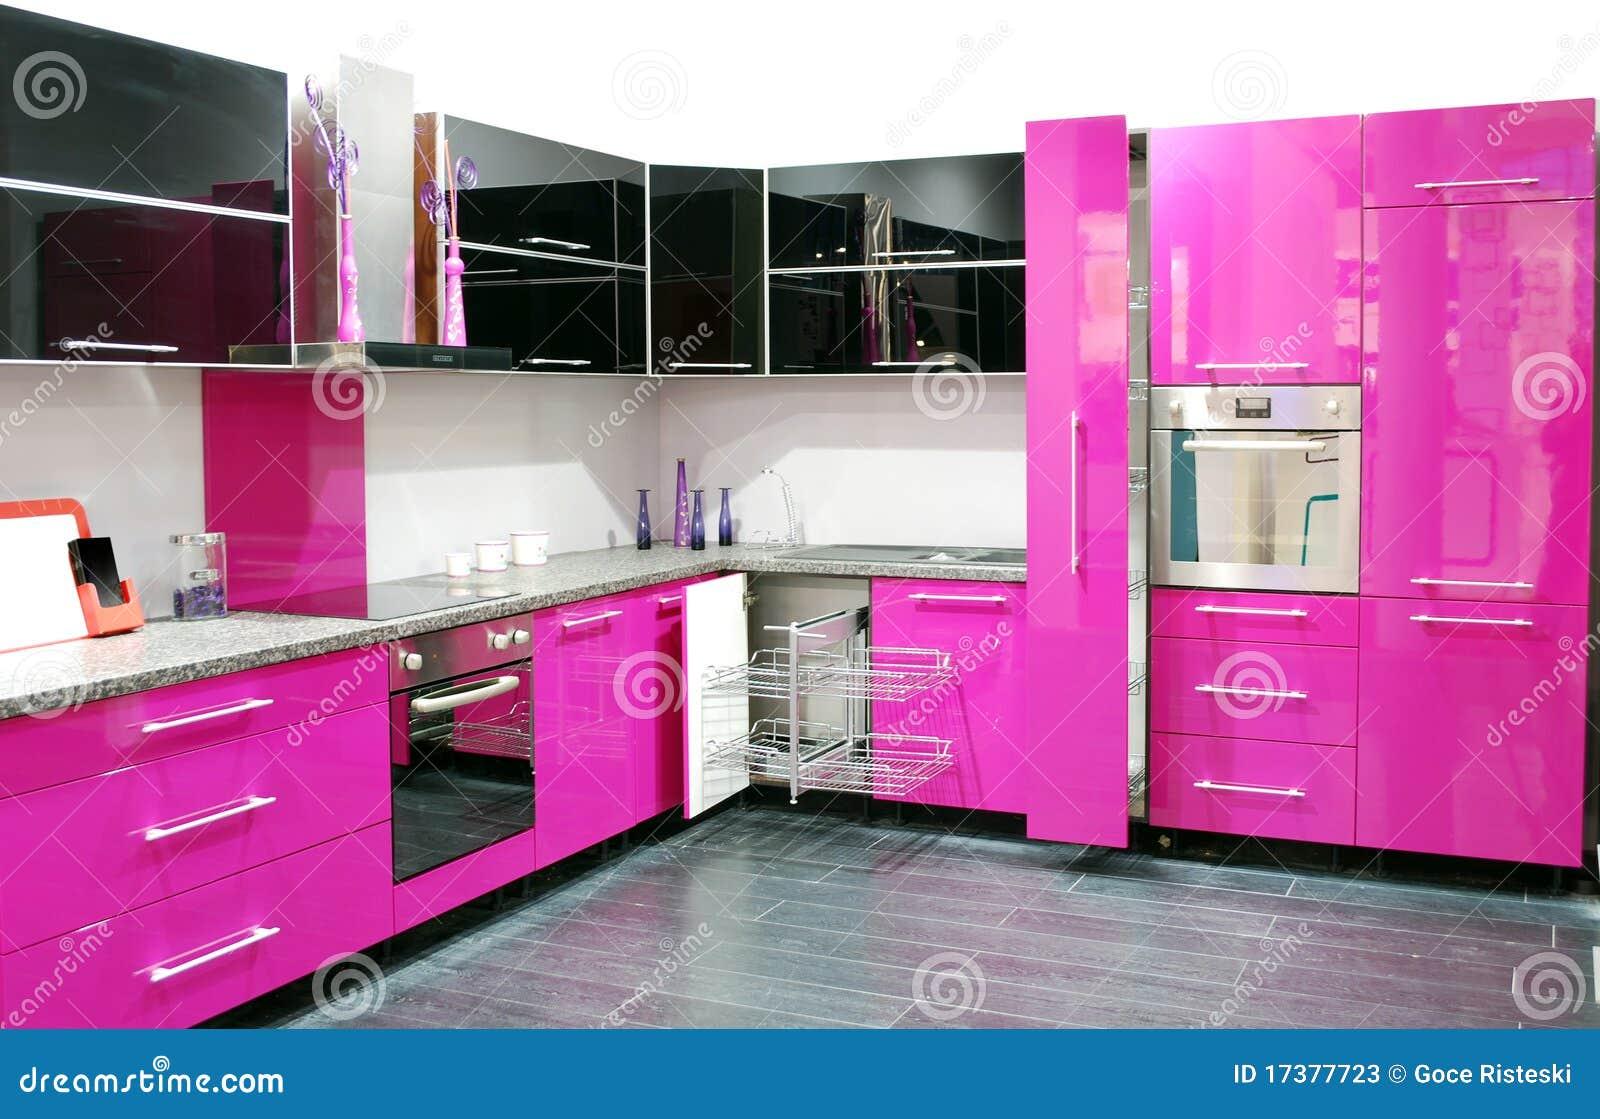 Pink kitchen stock photos image 17377723 - Roze keuken fuchsia ...